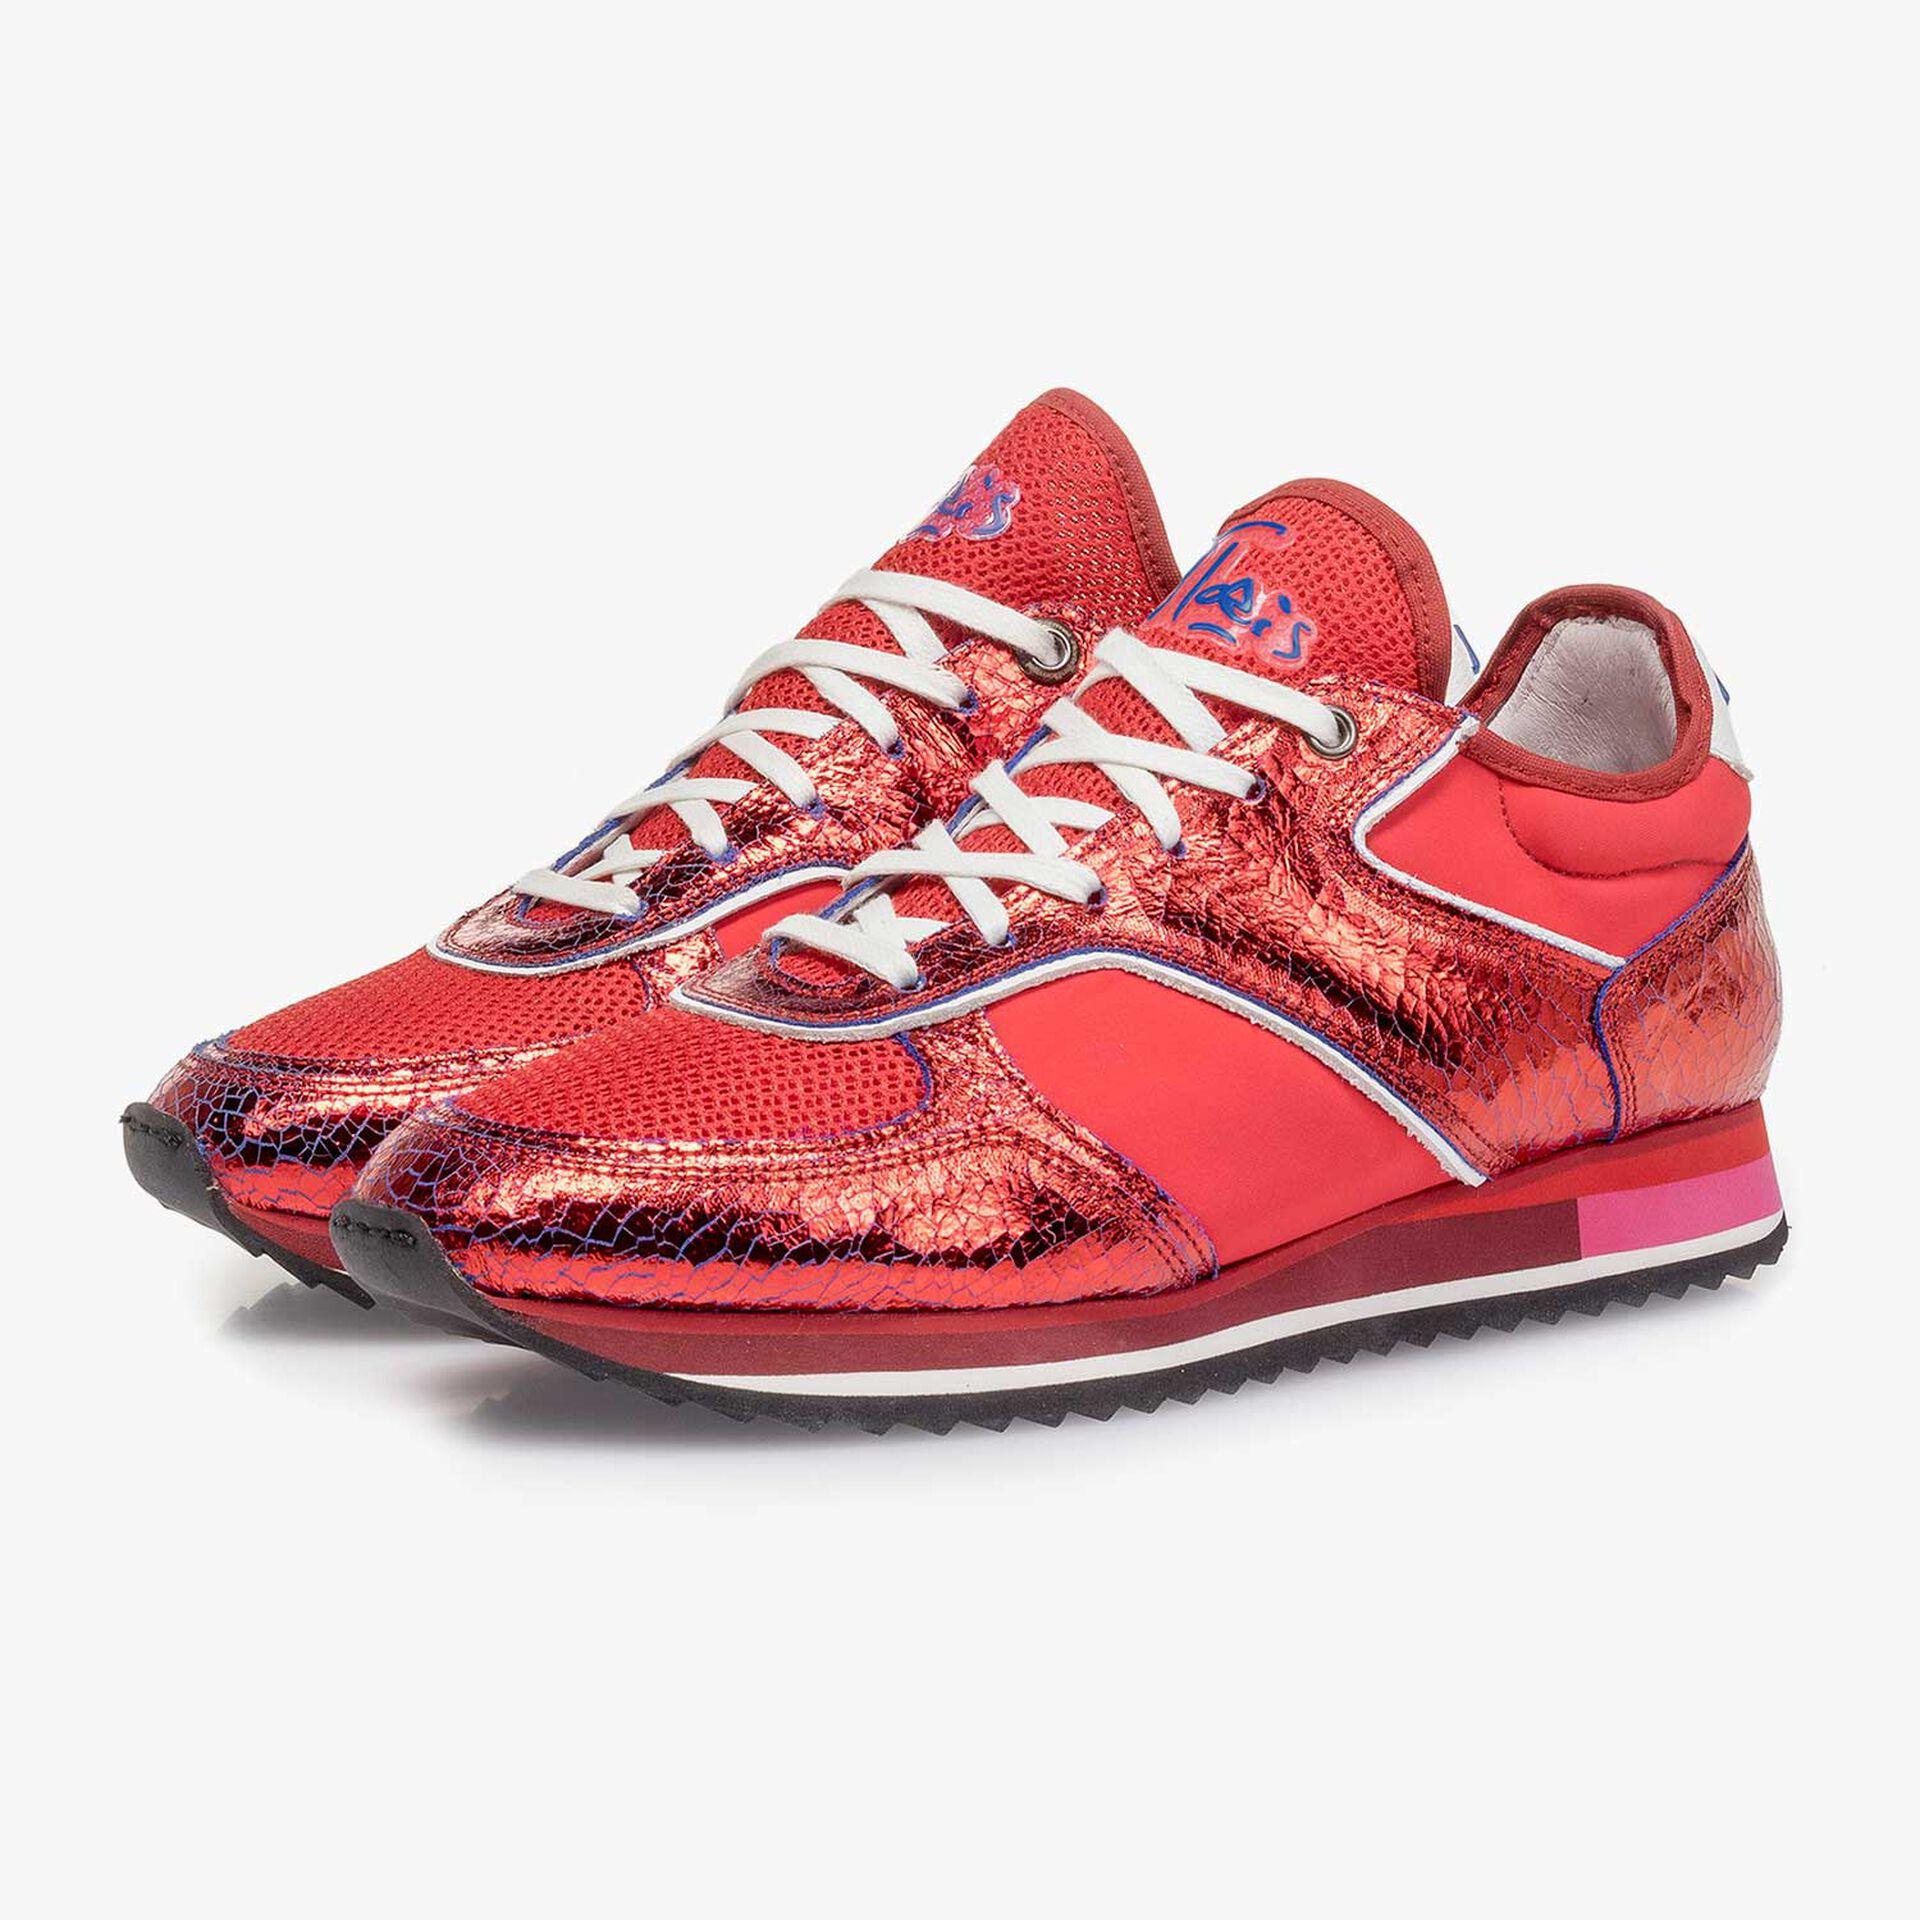 Roter Metallic Leder-Sneaker mit changierendem Effekt